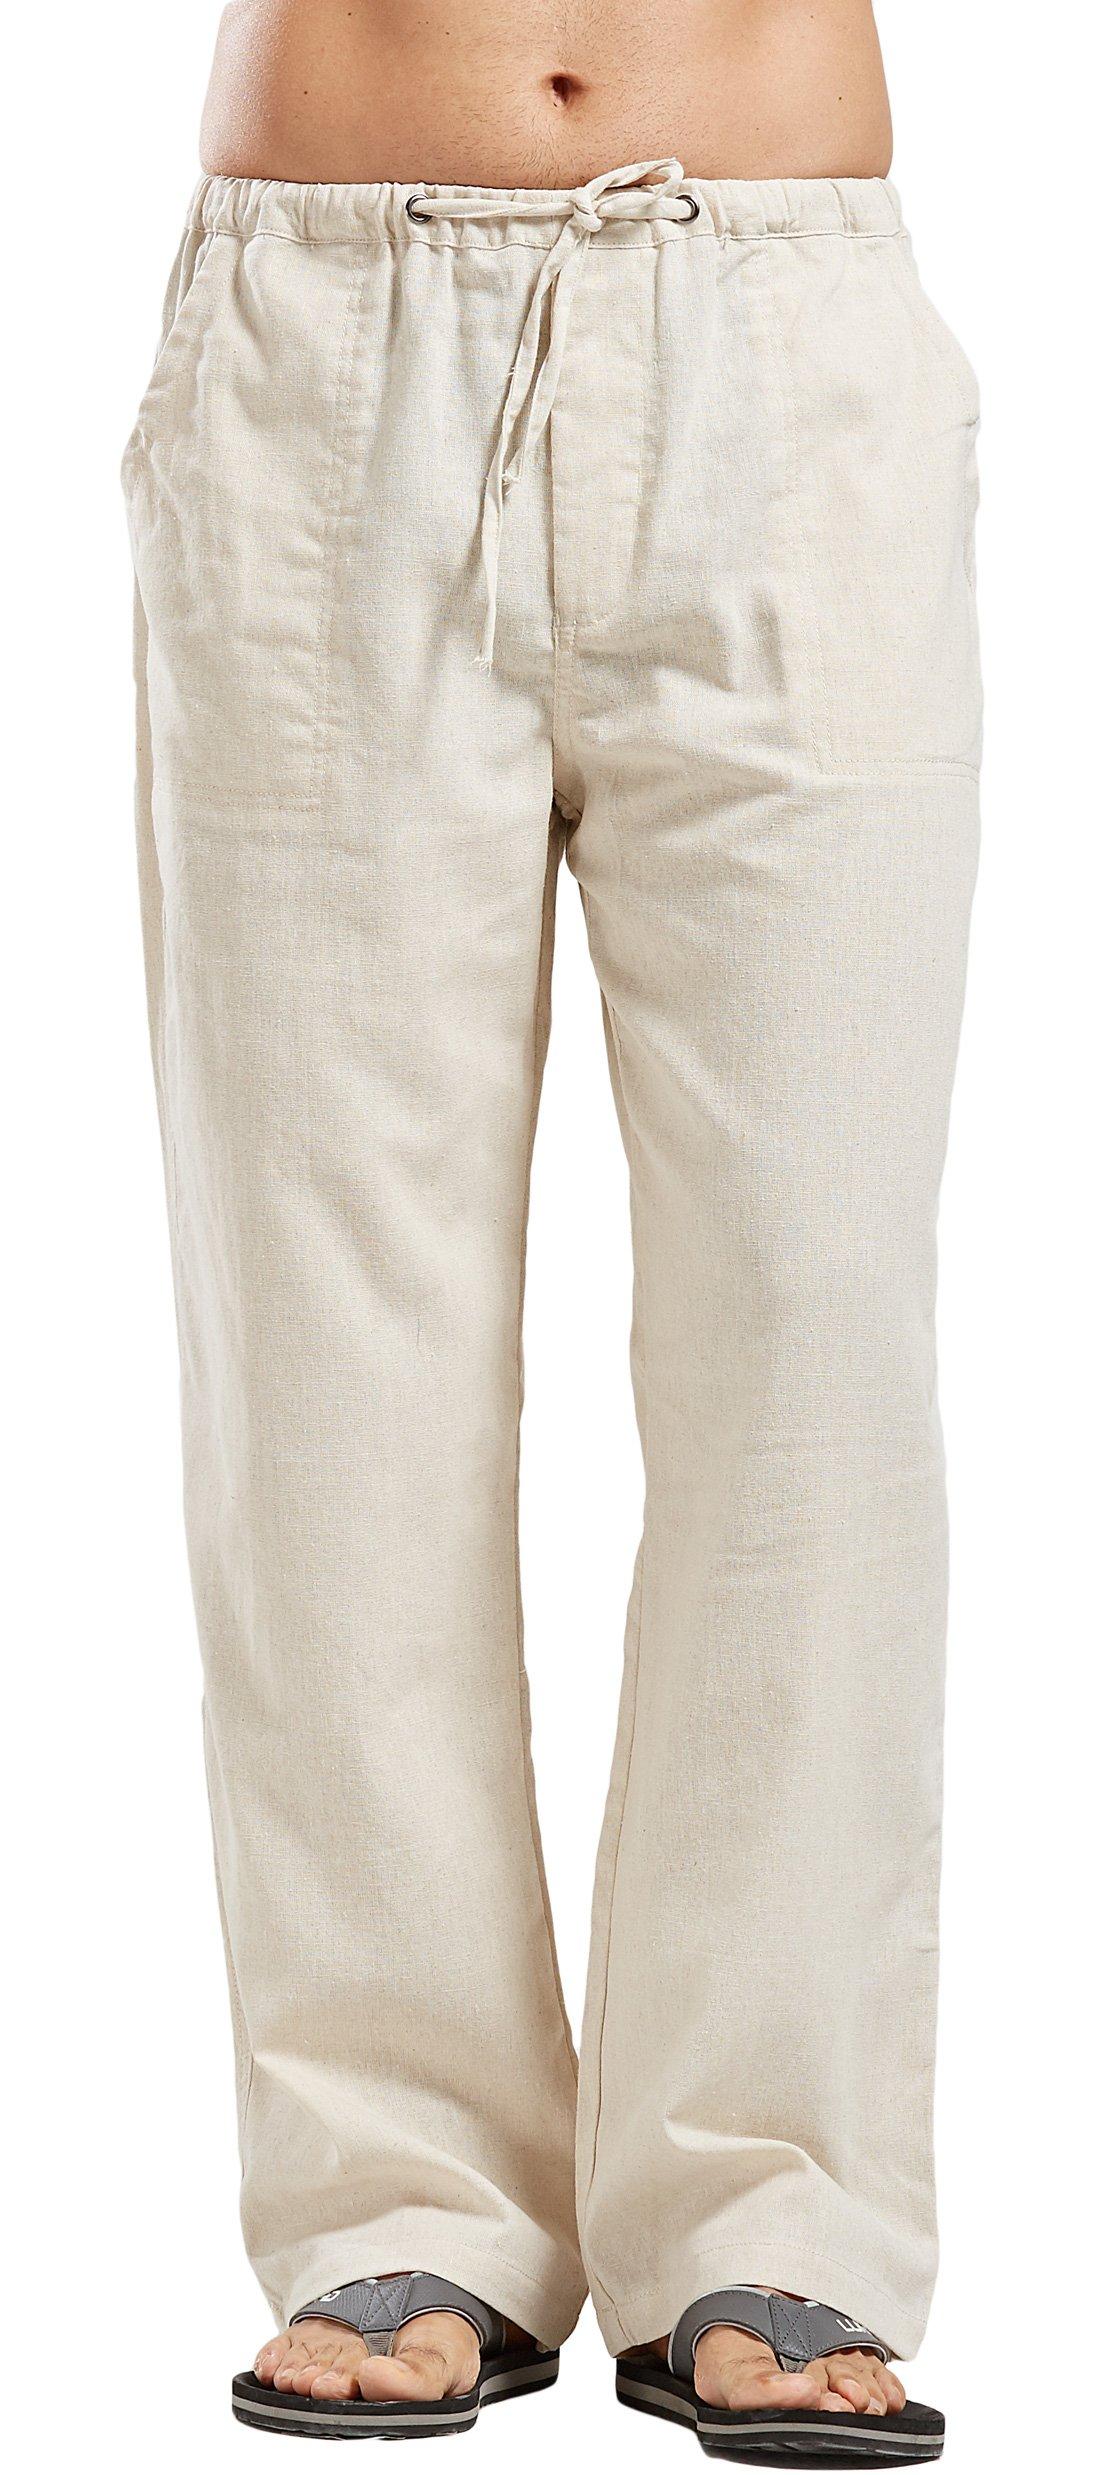 utcoco Qiuse Men's Casual Loose Fit Straight-Legs Stretchy Waist Beach Pants